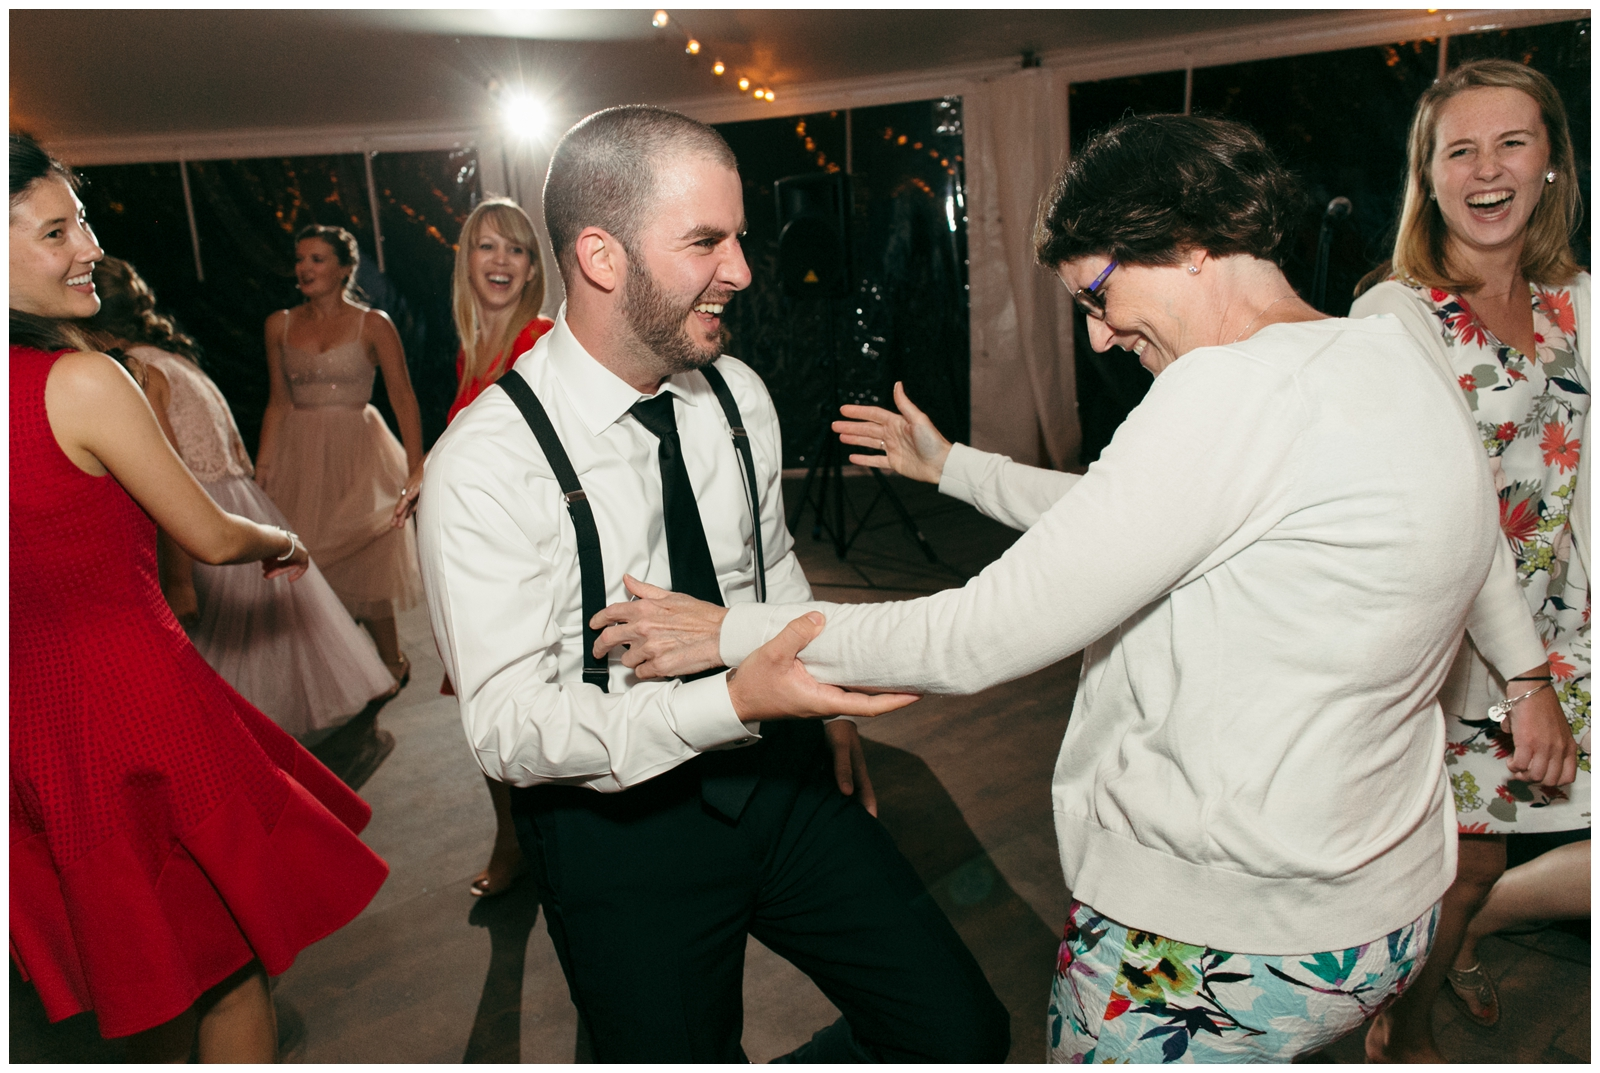 Moraine-Farm-wedding-Bailey-Q-Photo-Massachusetts-wedding-photpgrapher-153.jpg